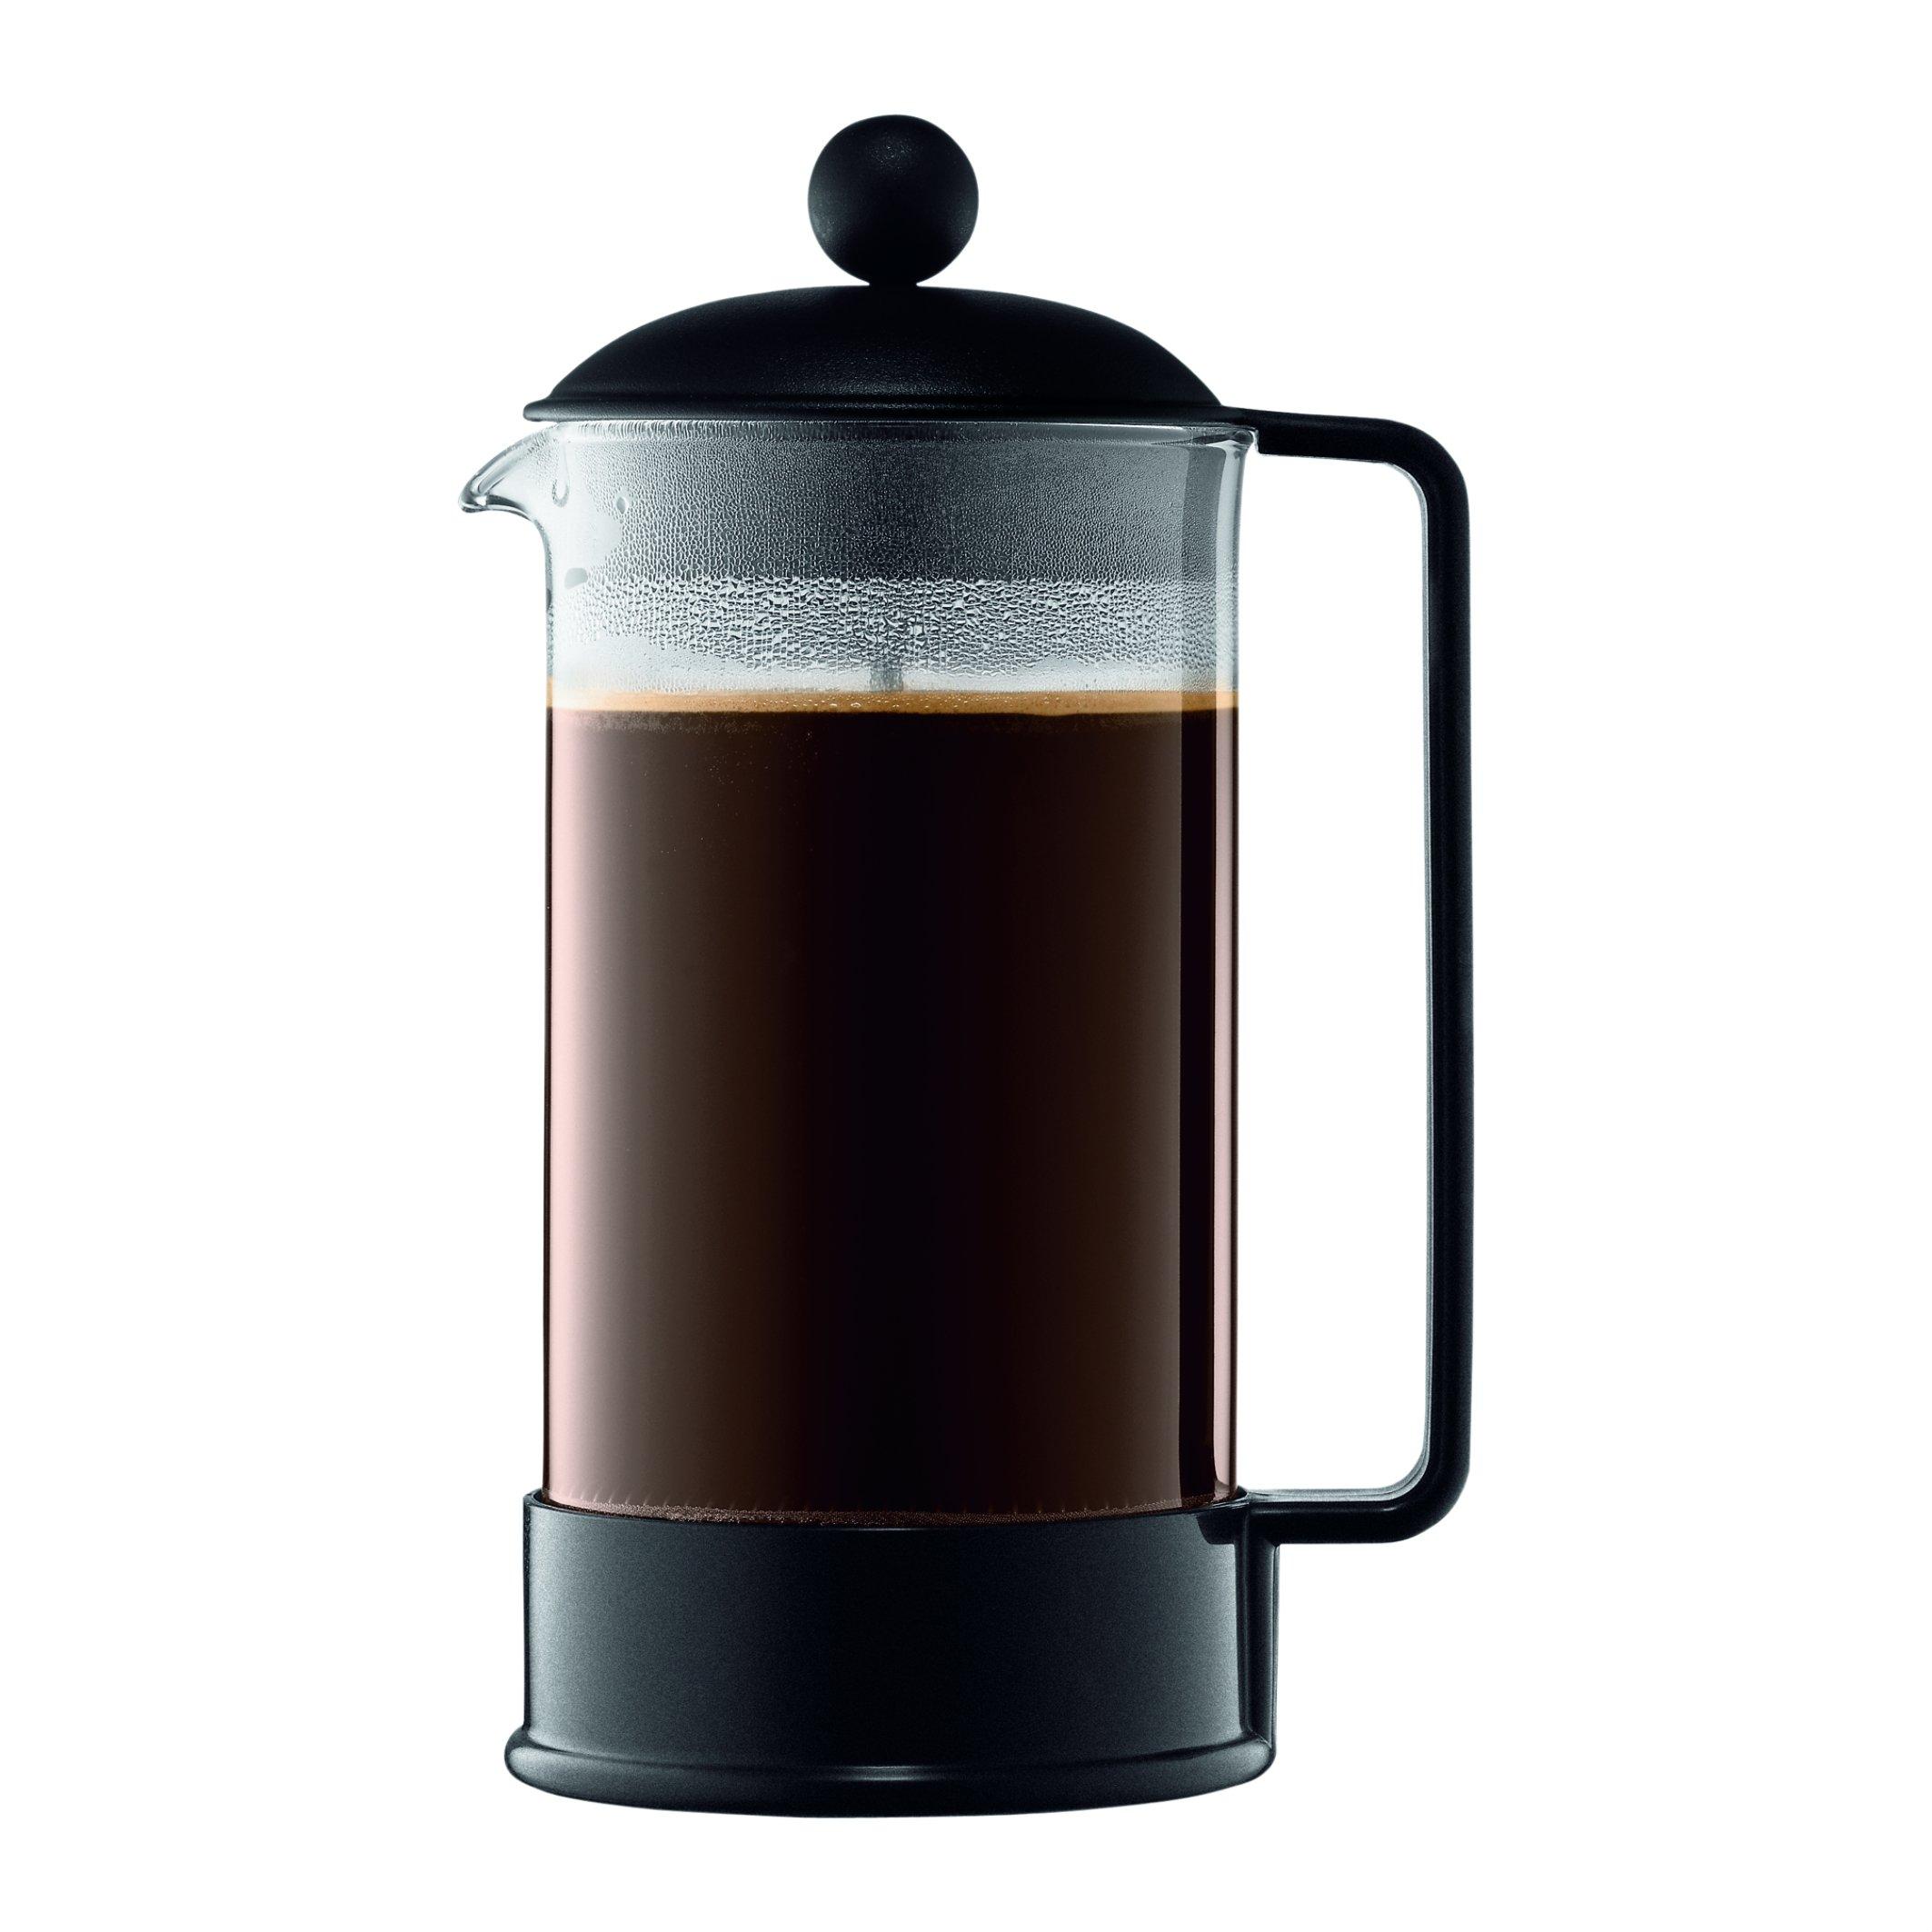 Bodum 1548-01US Brazil French Press Coffee and Tea Maker, 34 Ounce, Black by Bodum